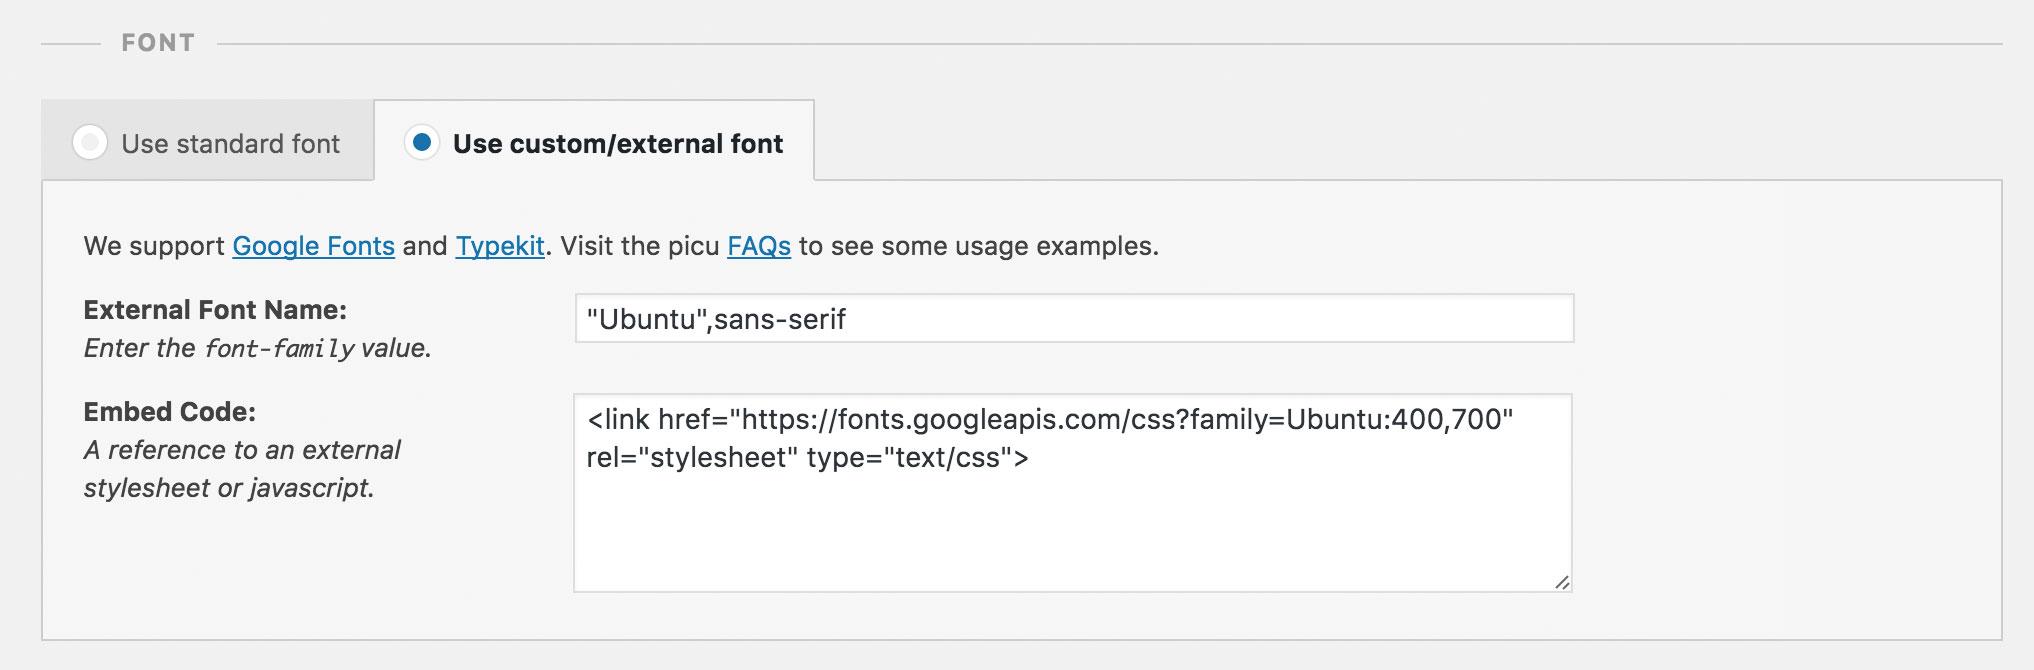 Screenshot of external font UI in picu using Google Fonts